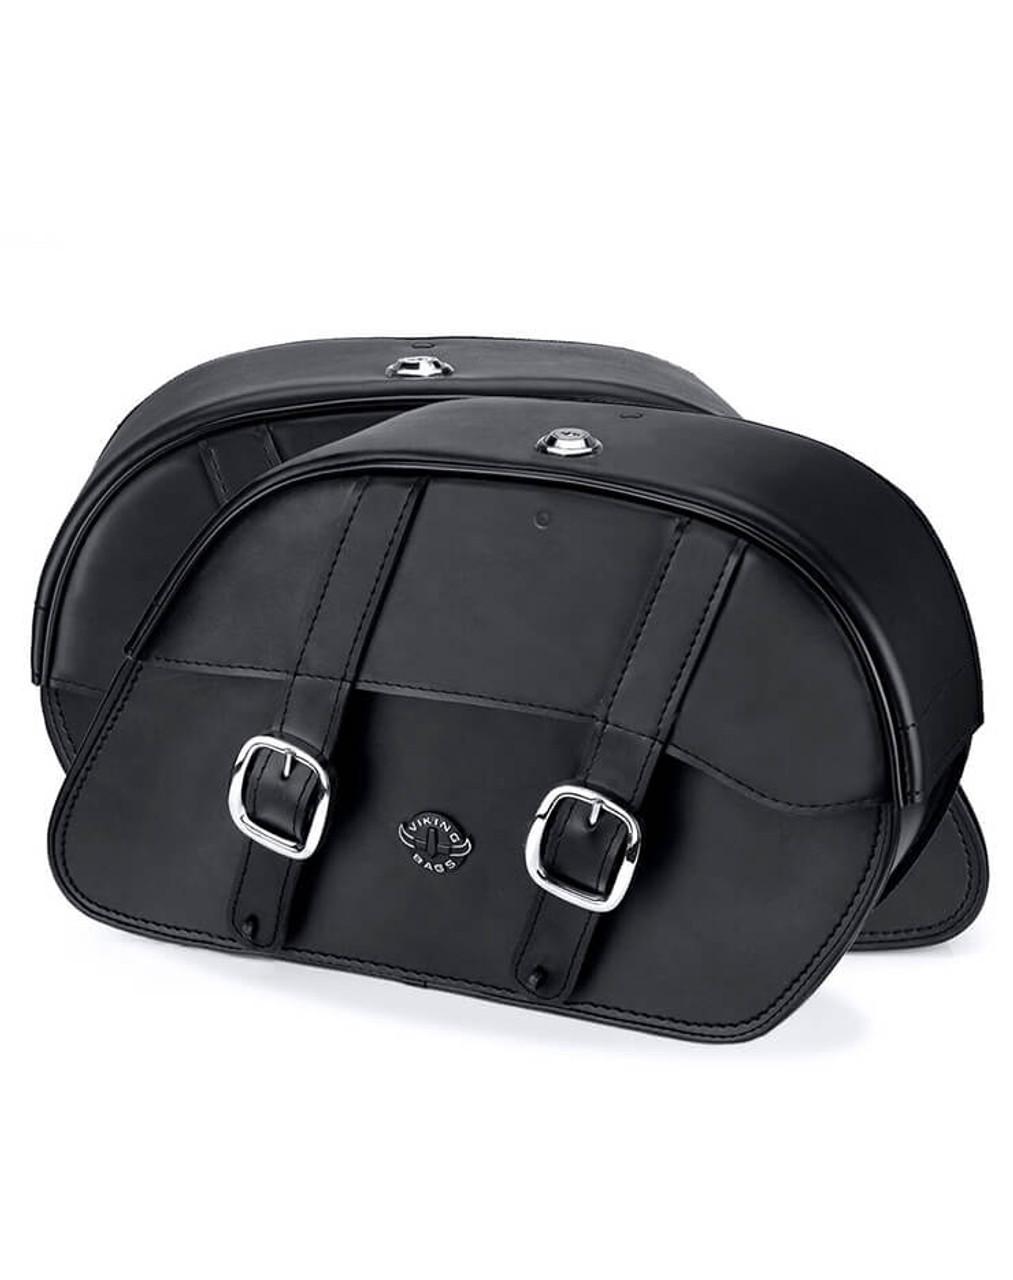 Yamaha V Star 1100 Classic Medium Slanted Motorcycle Saddlebags Both Bags View